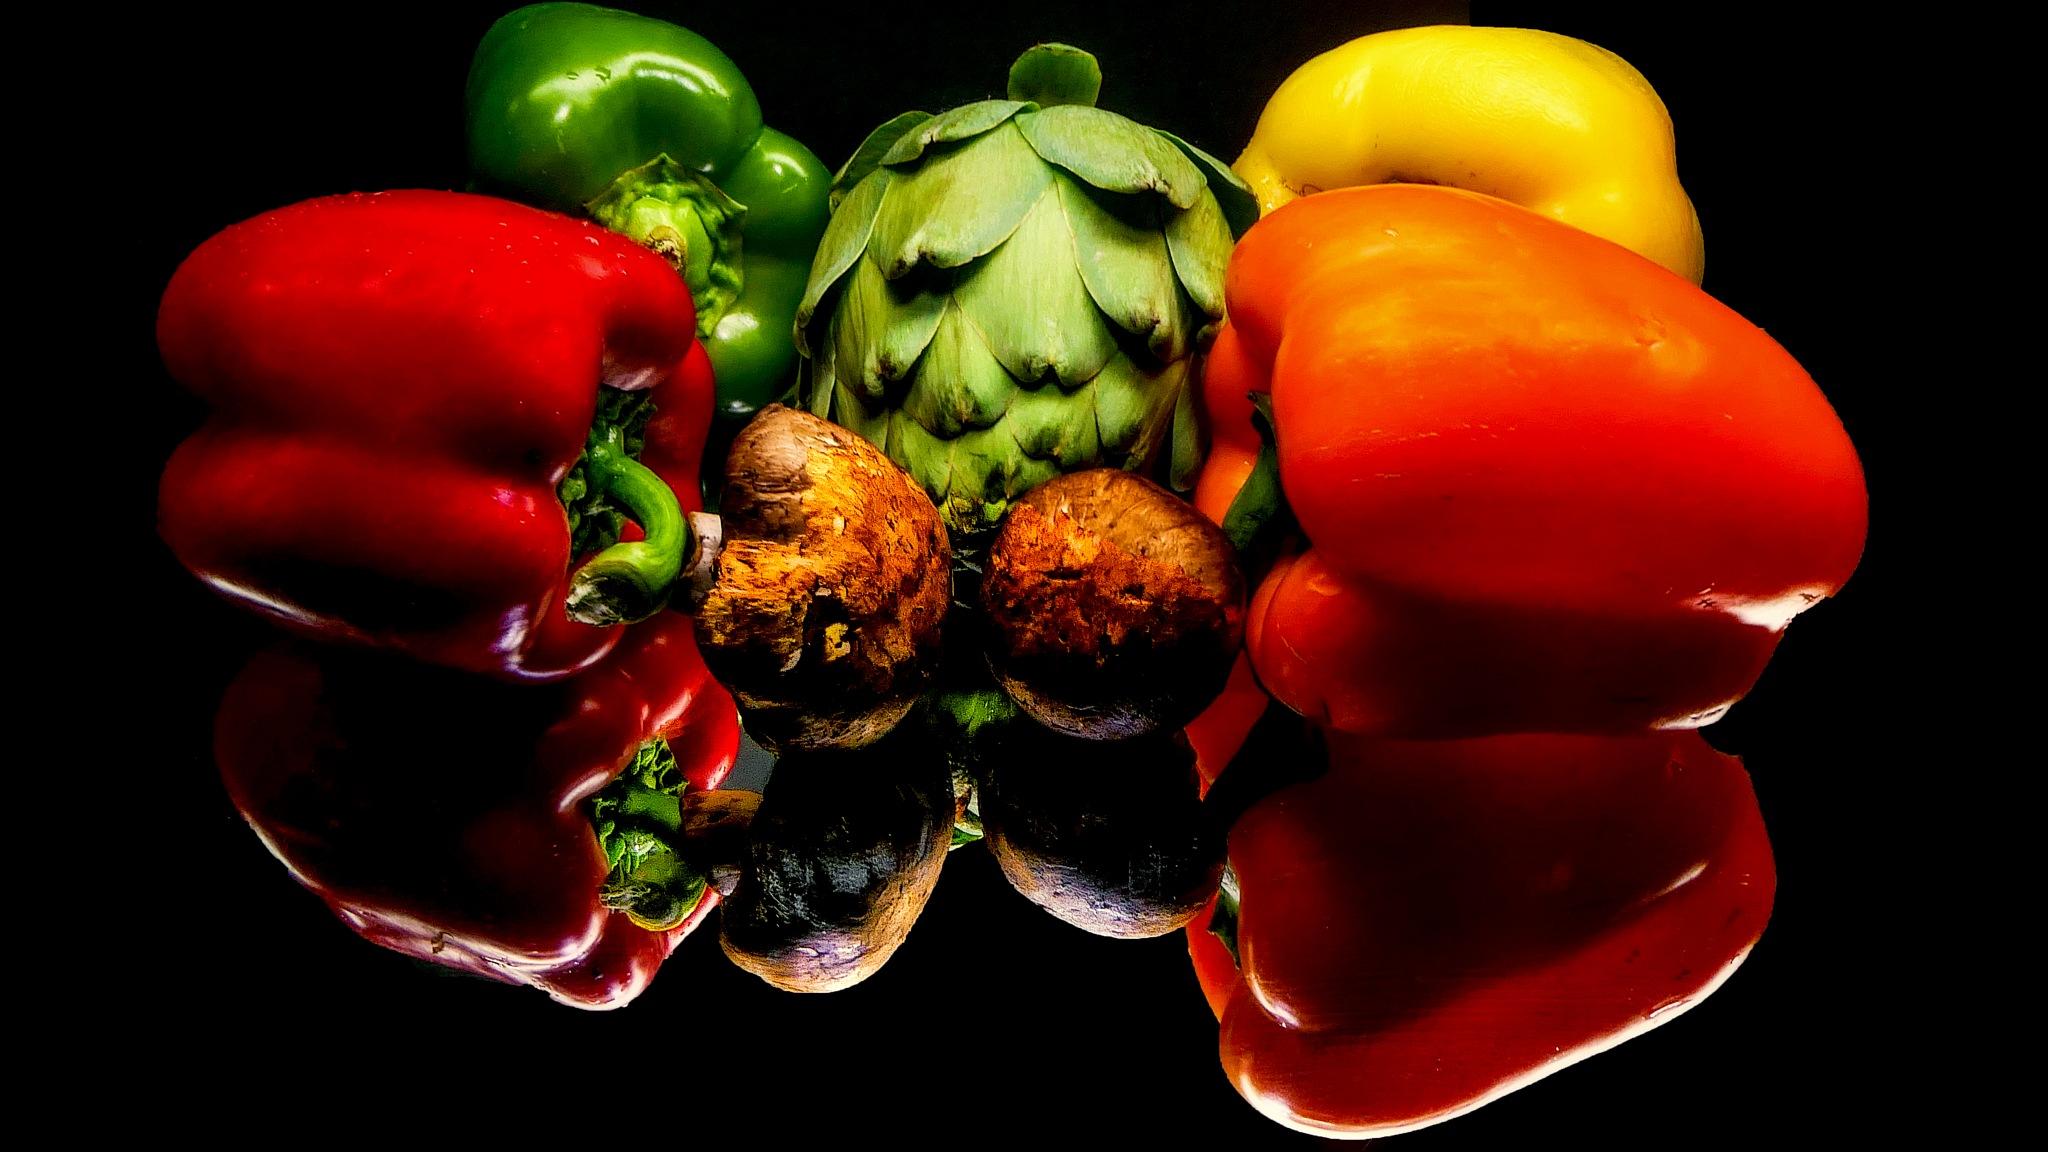 Fresh Veggies by David Walters